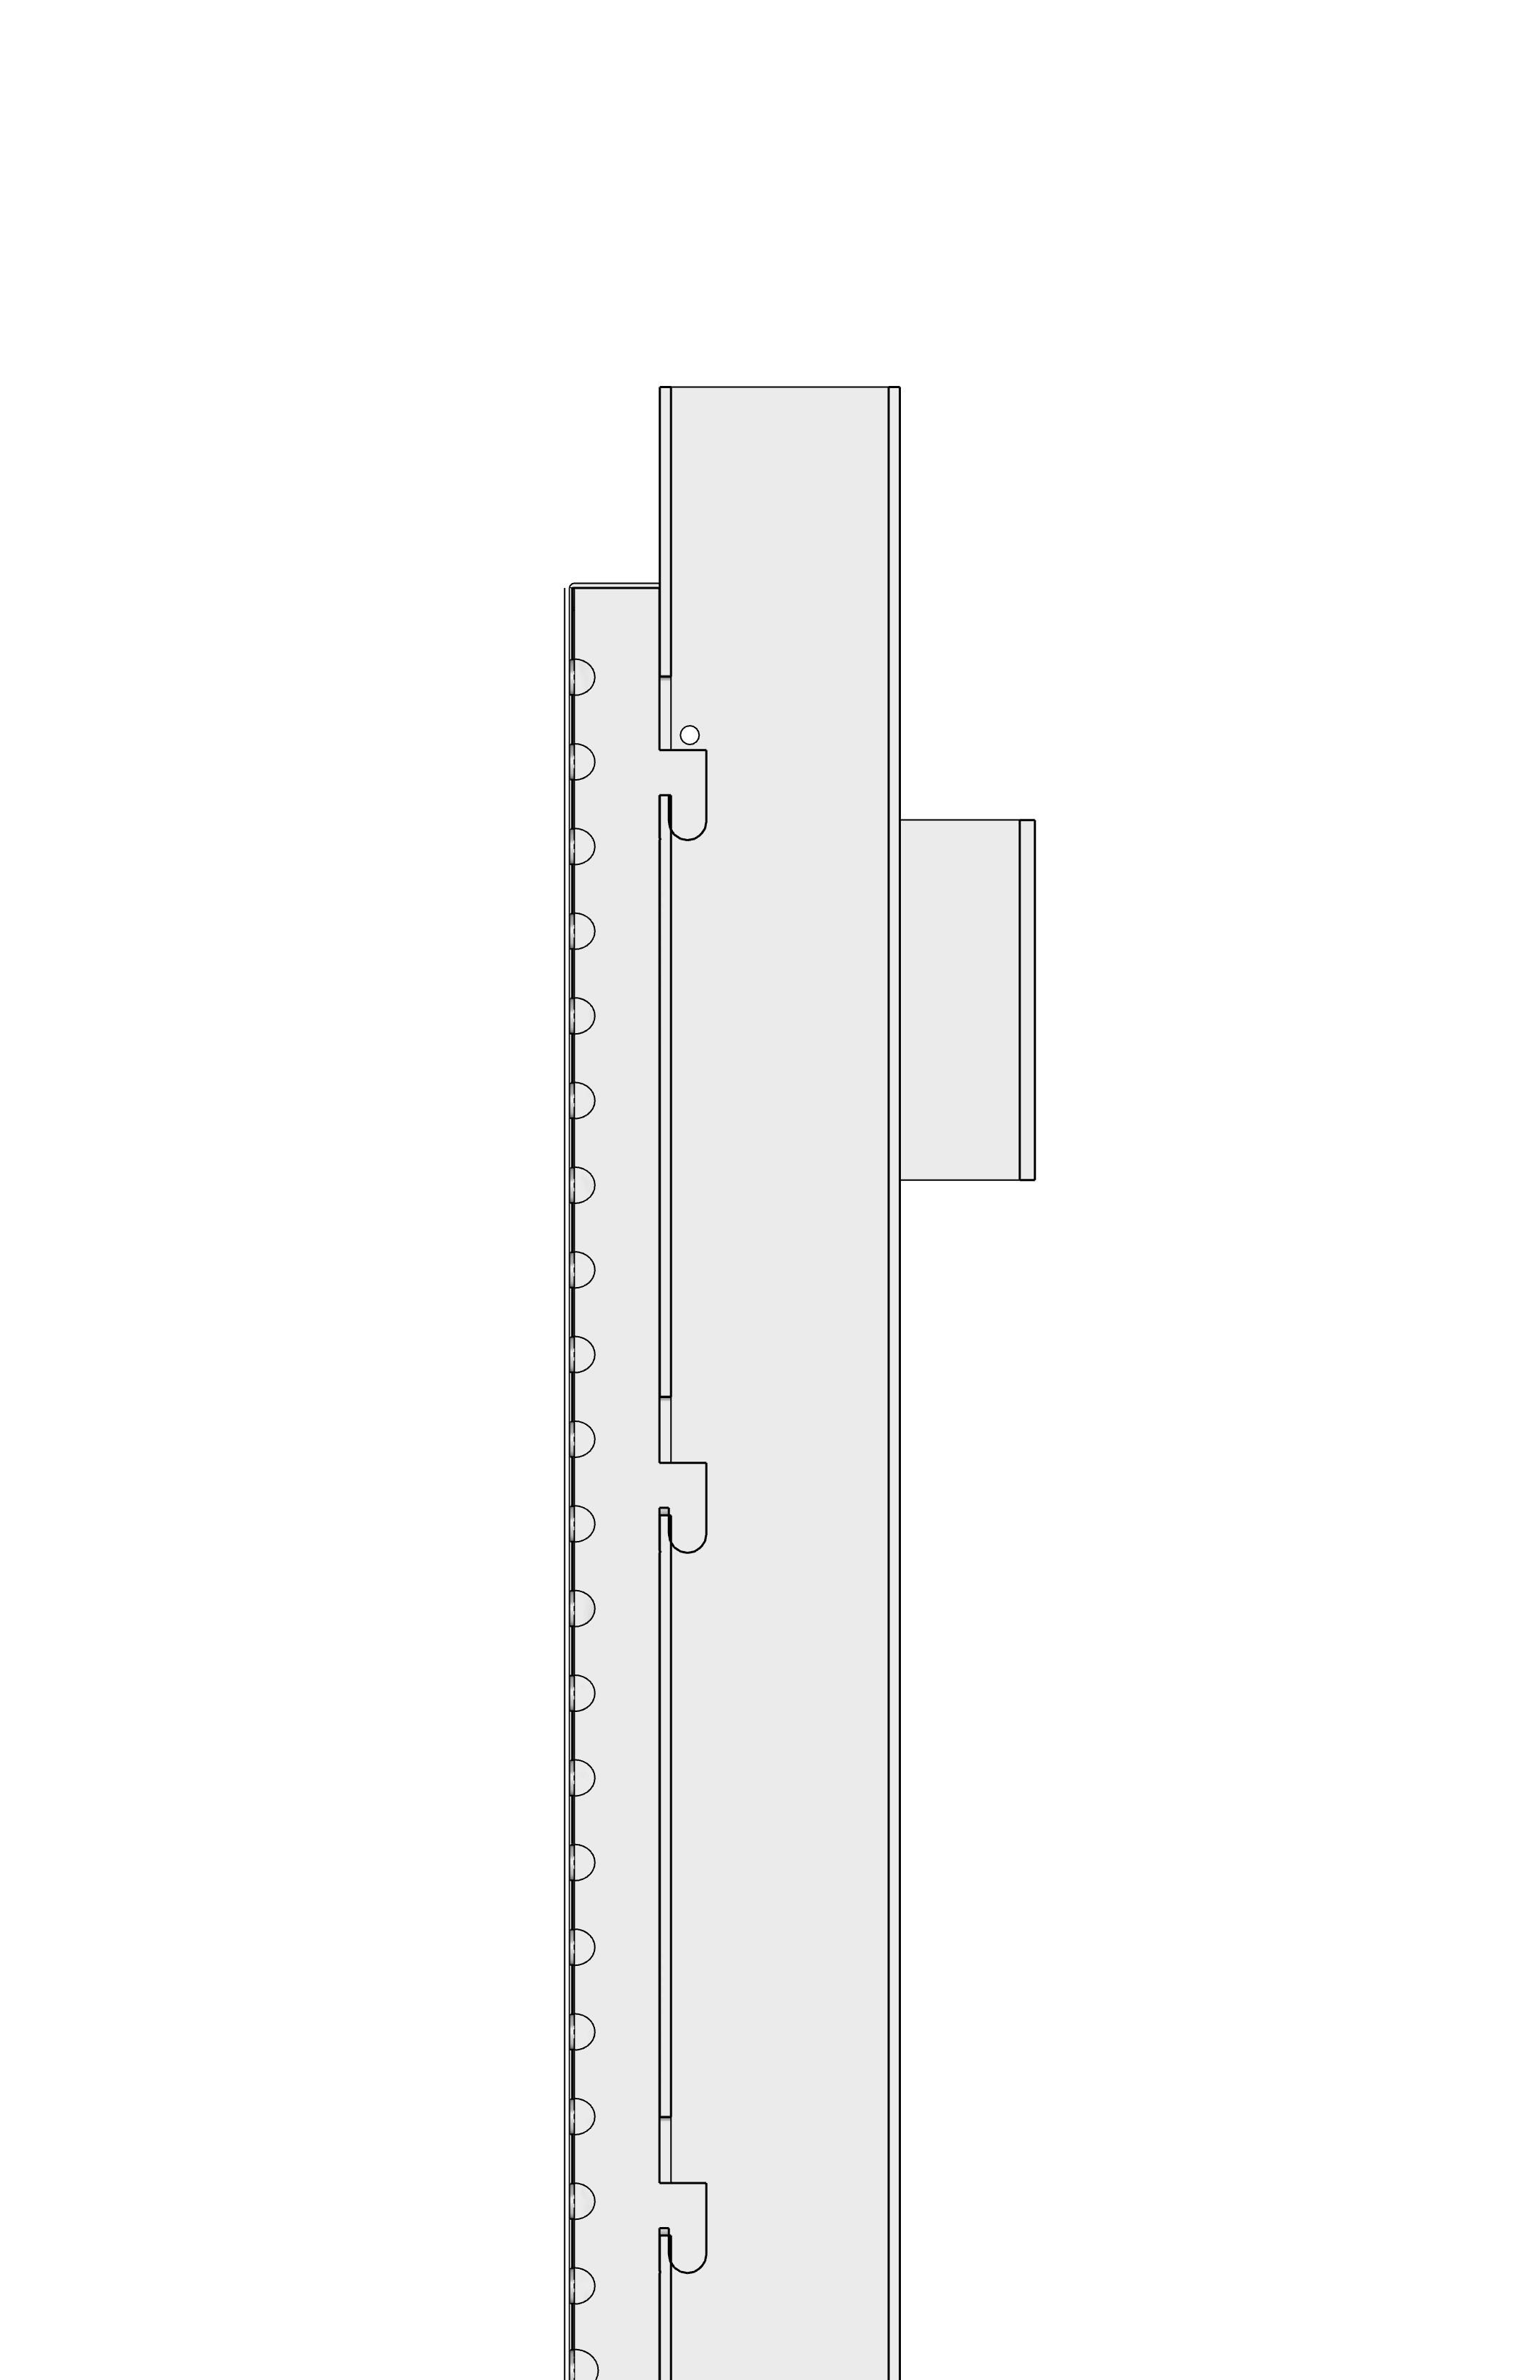 Profile model of installed Drop & Lock panel.